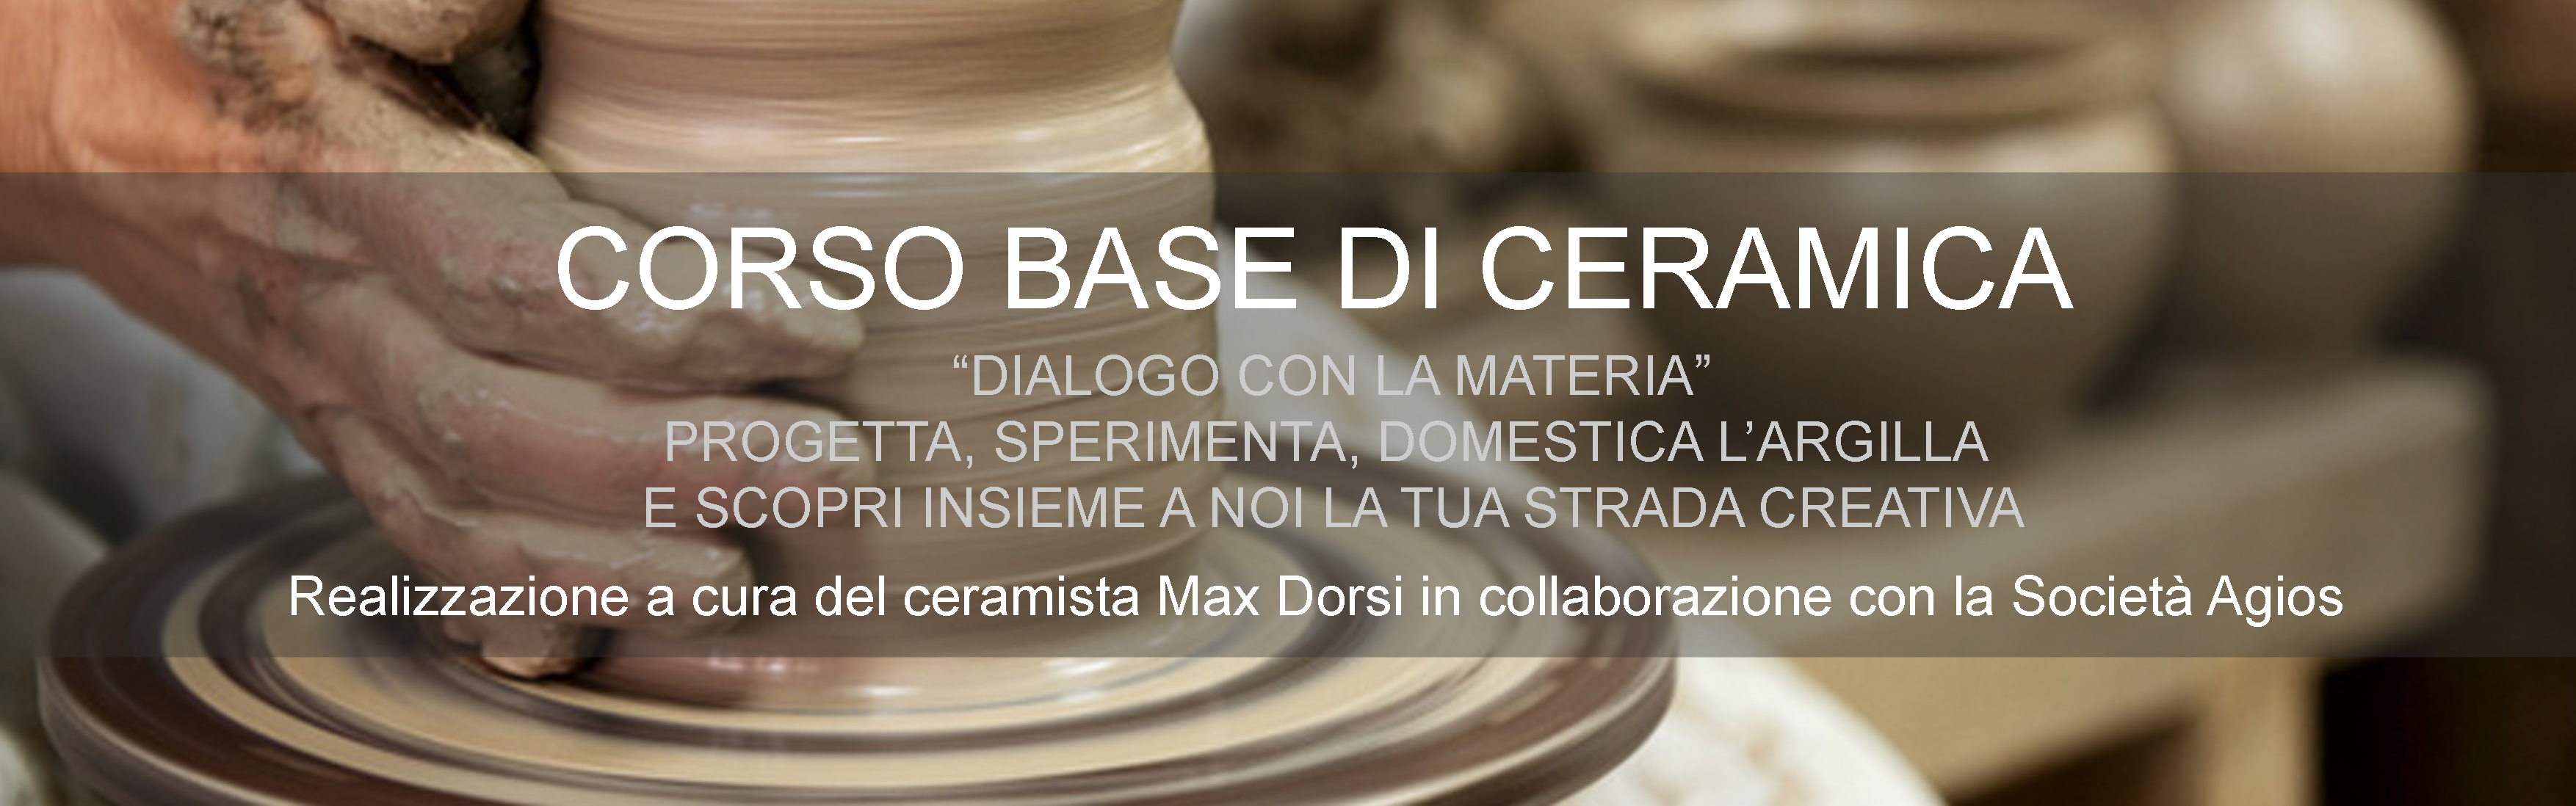 Corso ceramica base – febbraio 2016